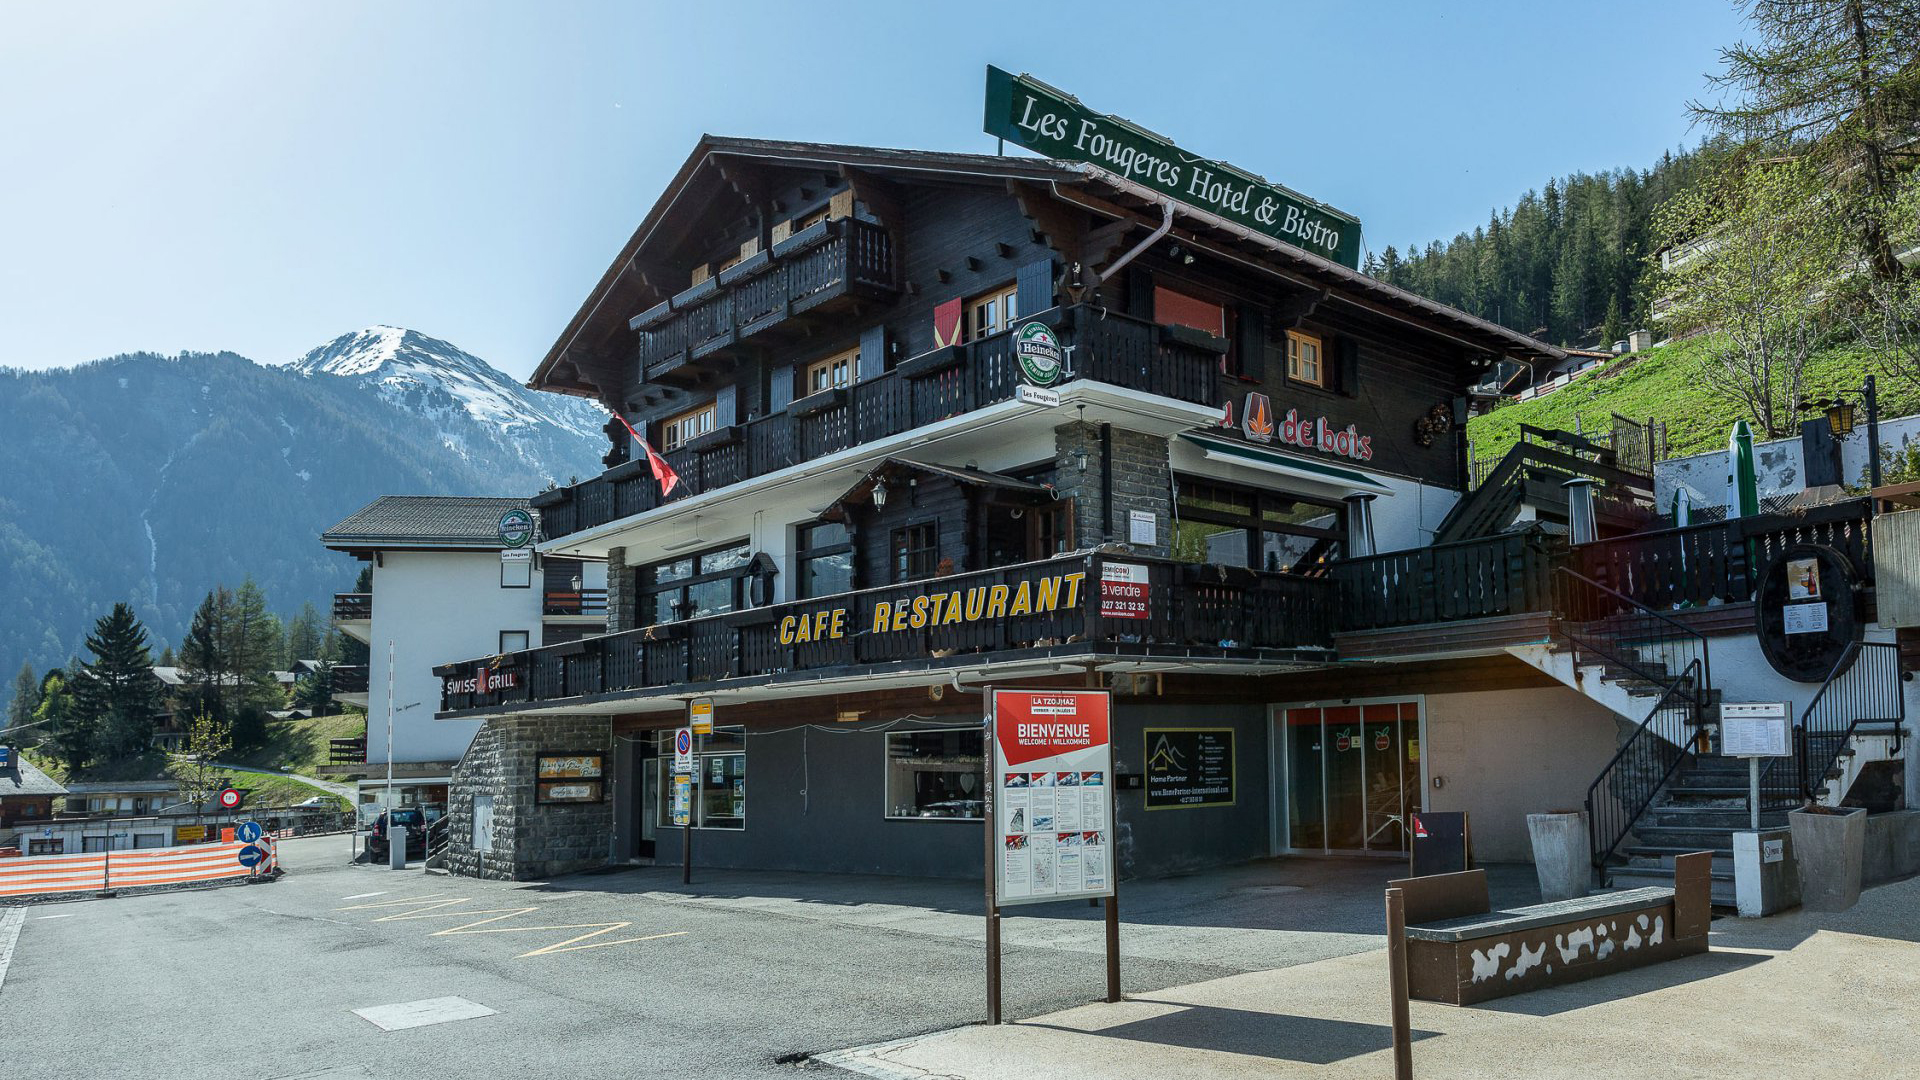 Les Fougeres Hotel, Switzerland